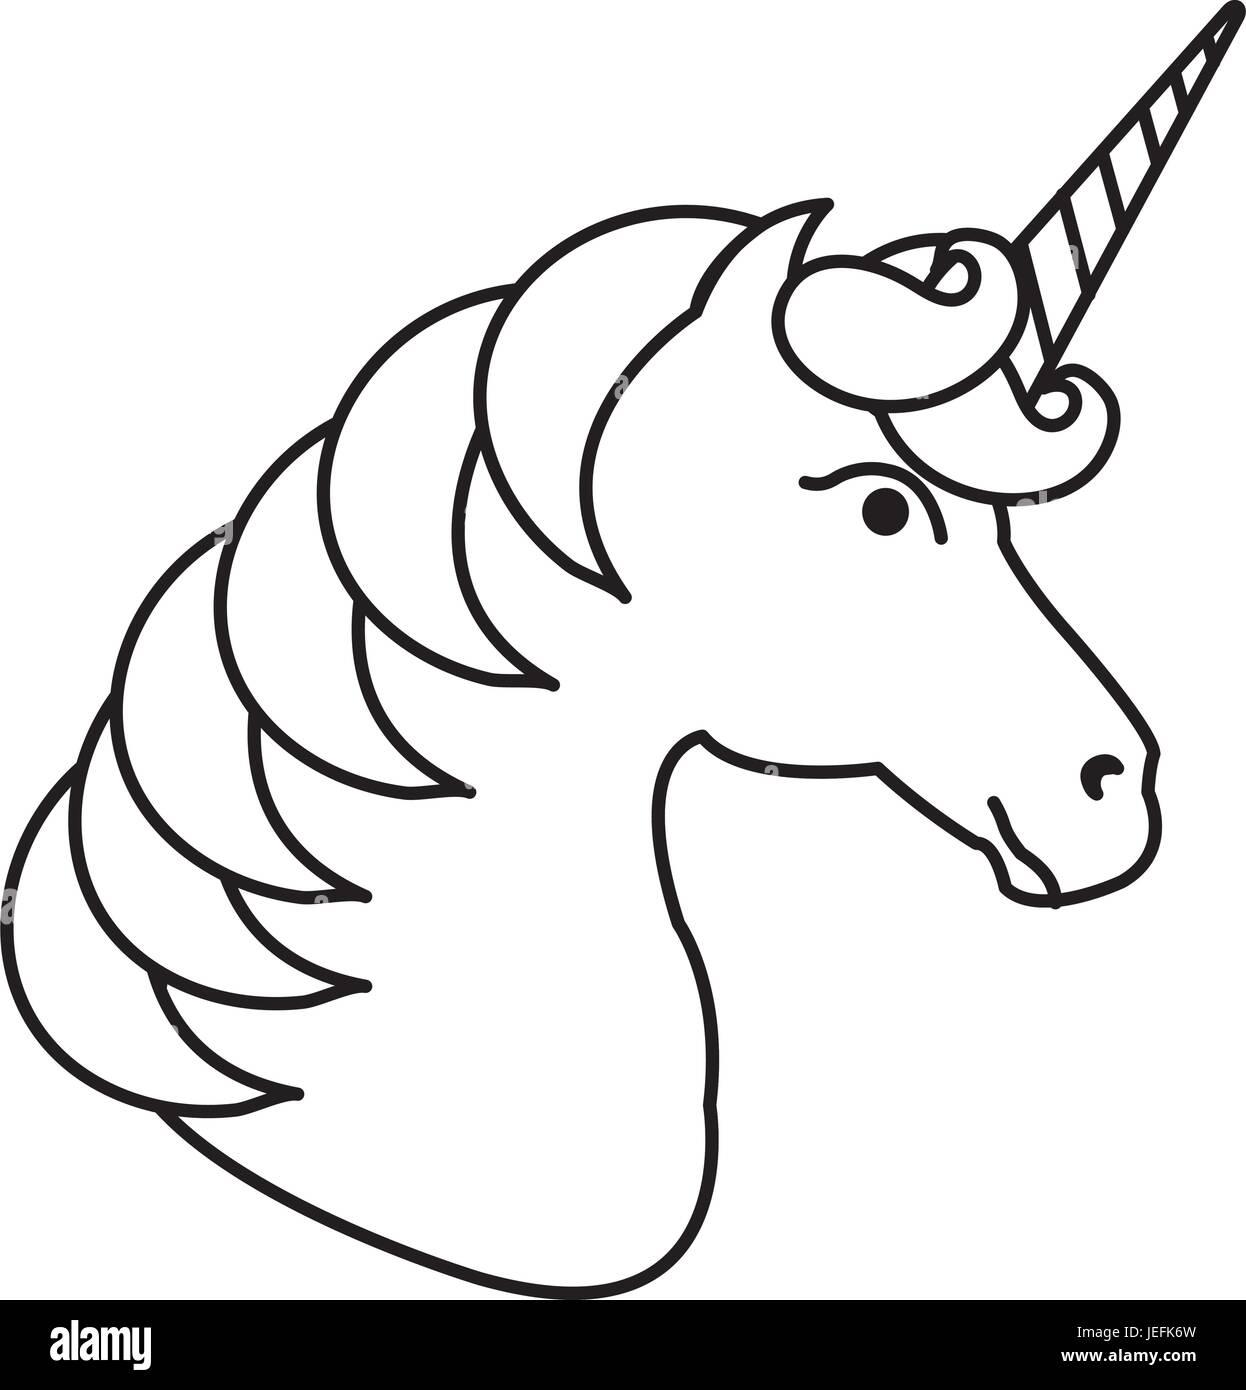 Einhorn-Tierhorn-Symbol-Vektor-Illustration-Design